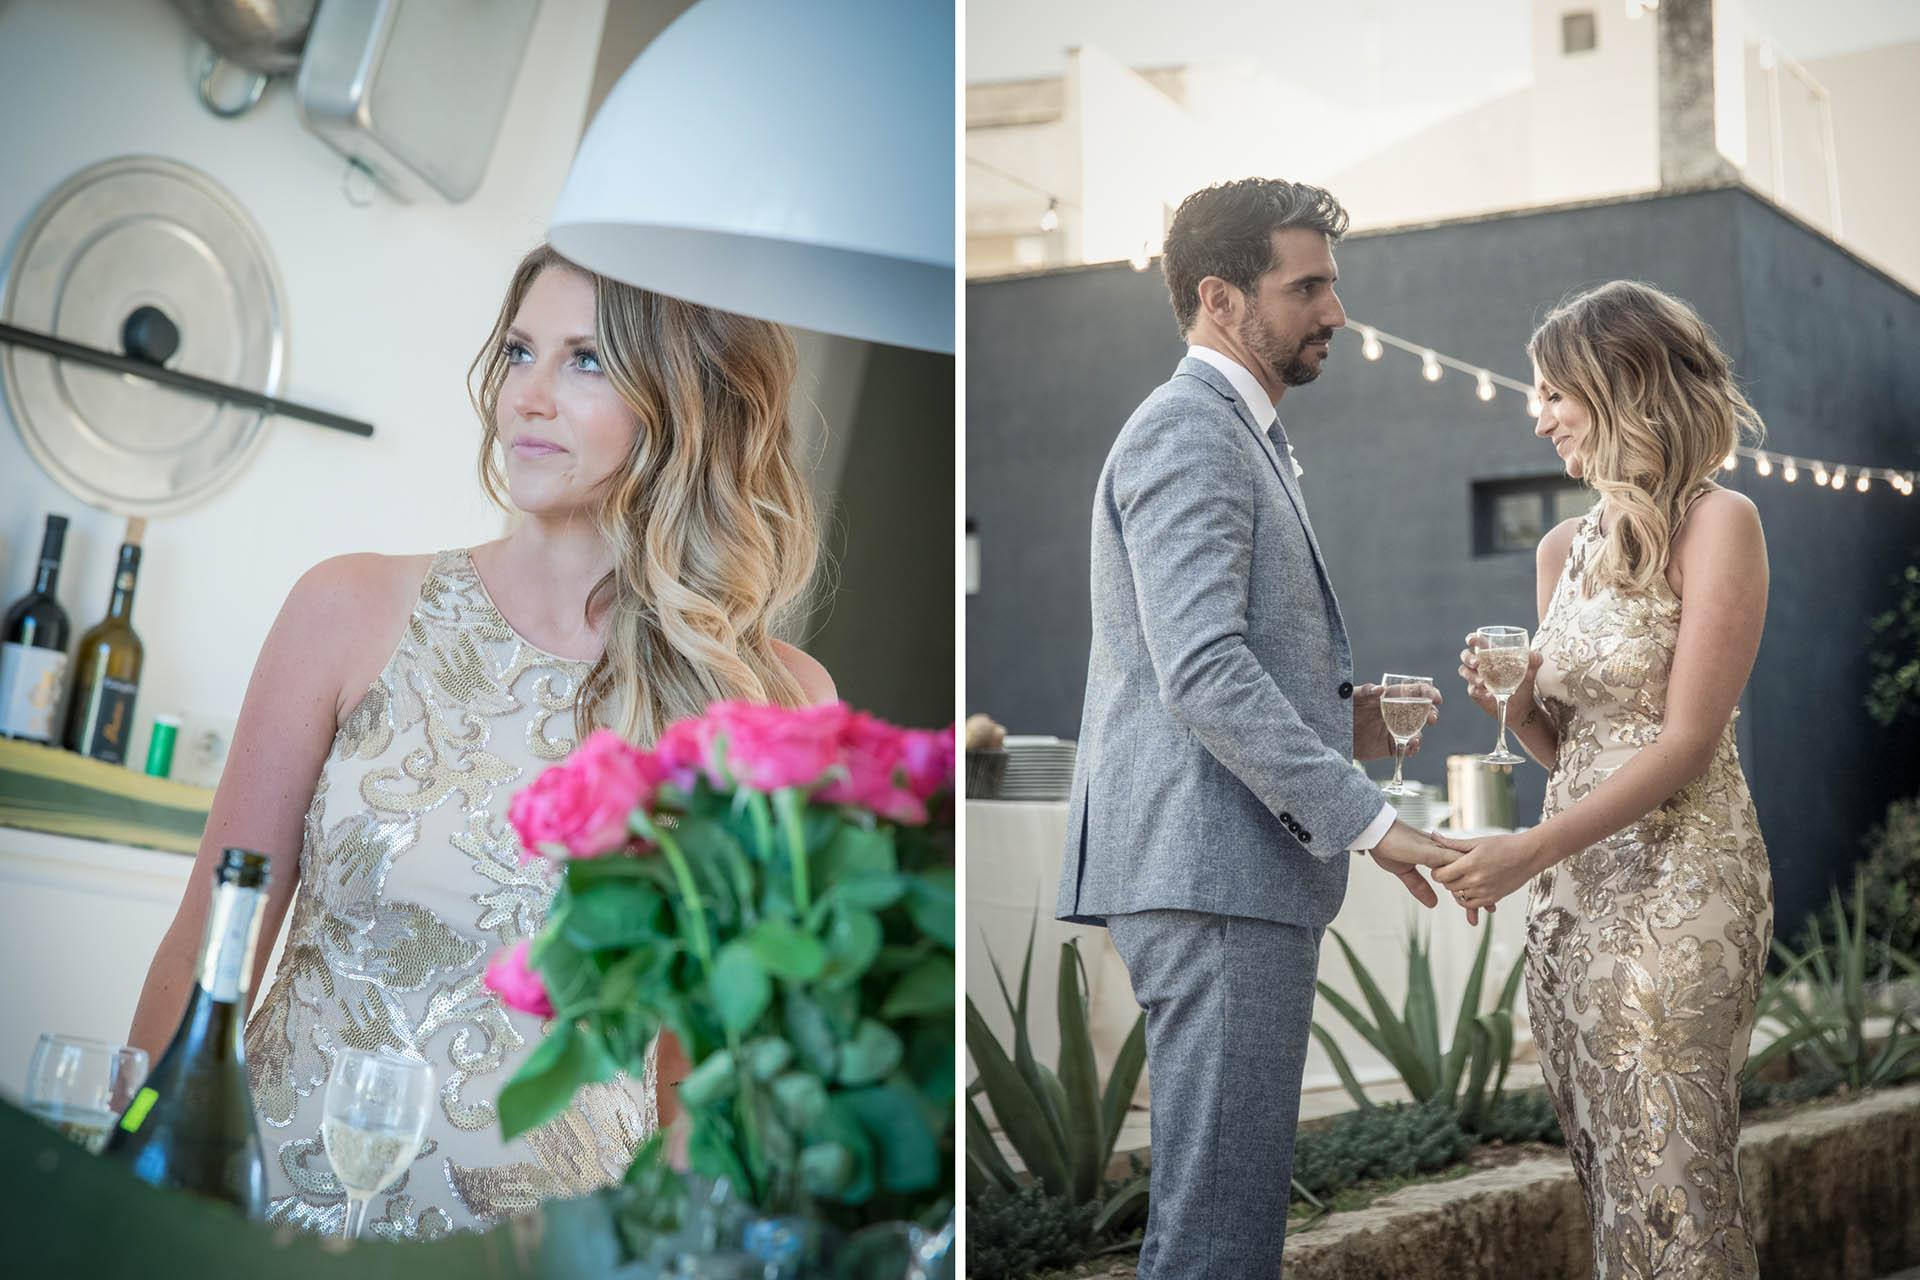 wedding palazzo daniele apulia 06-2.jpg